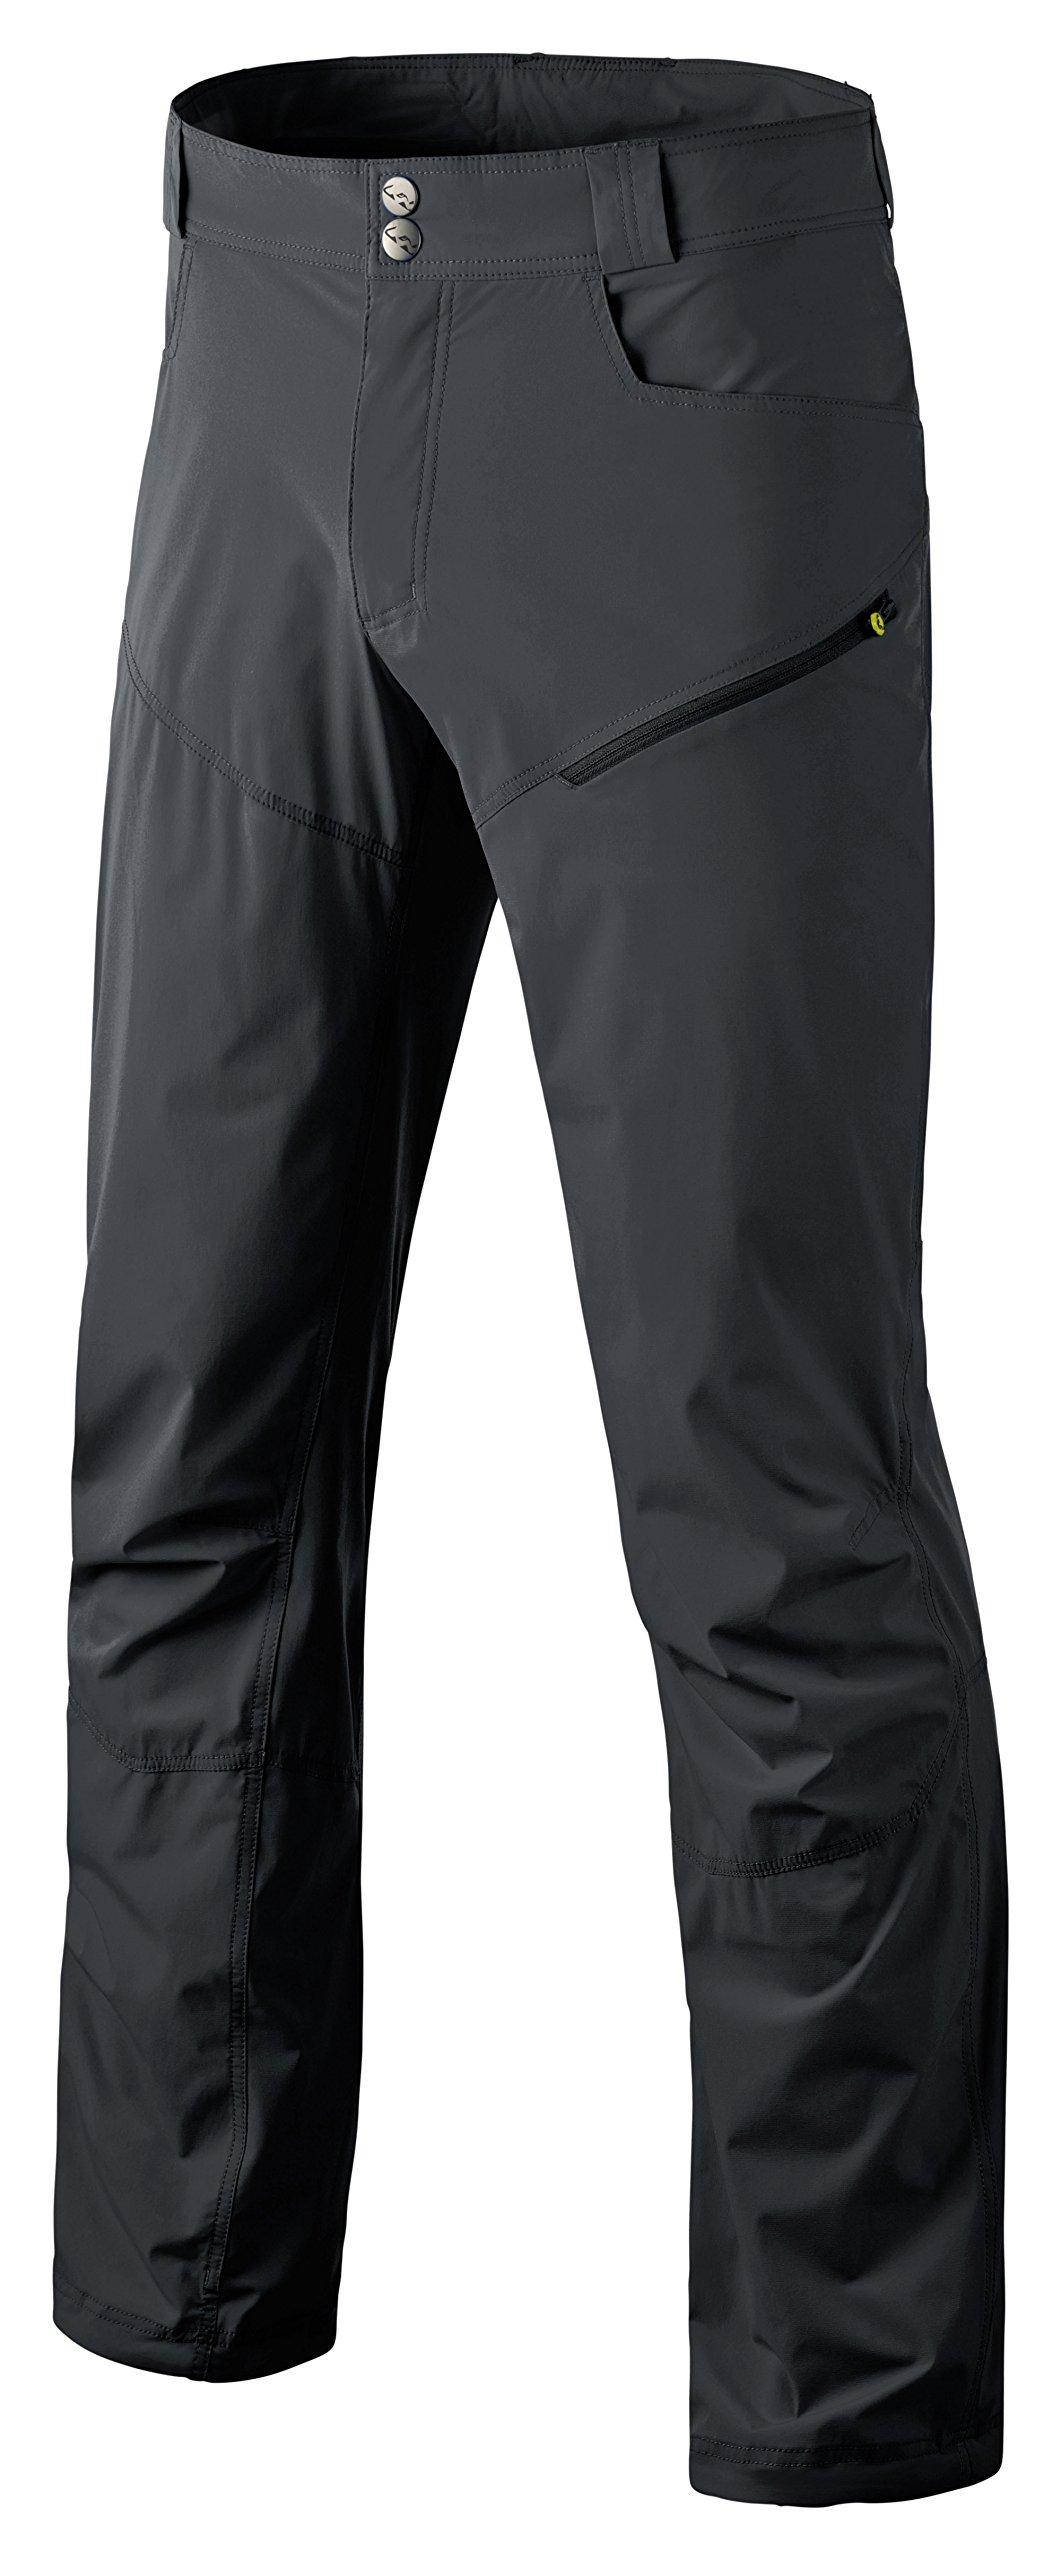 Dynafit Men's Traverse Dura Stretch Pants, Asphalt, Large by Dynafit